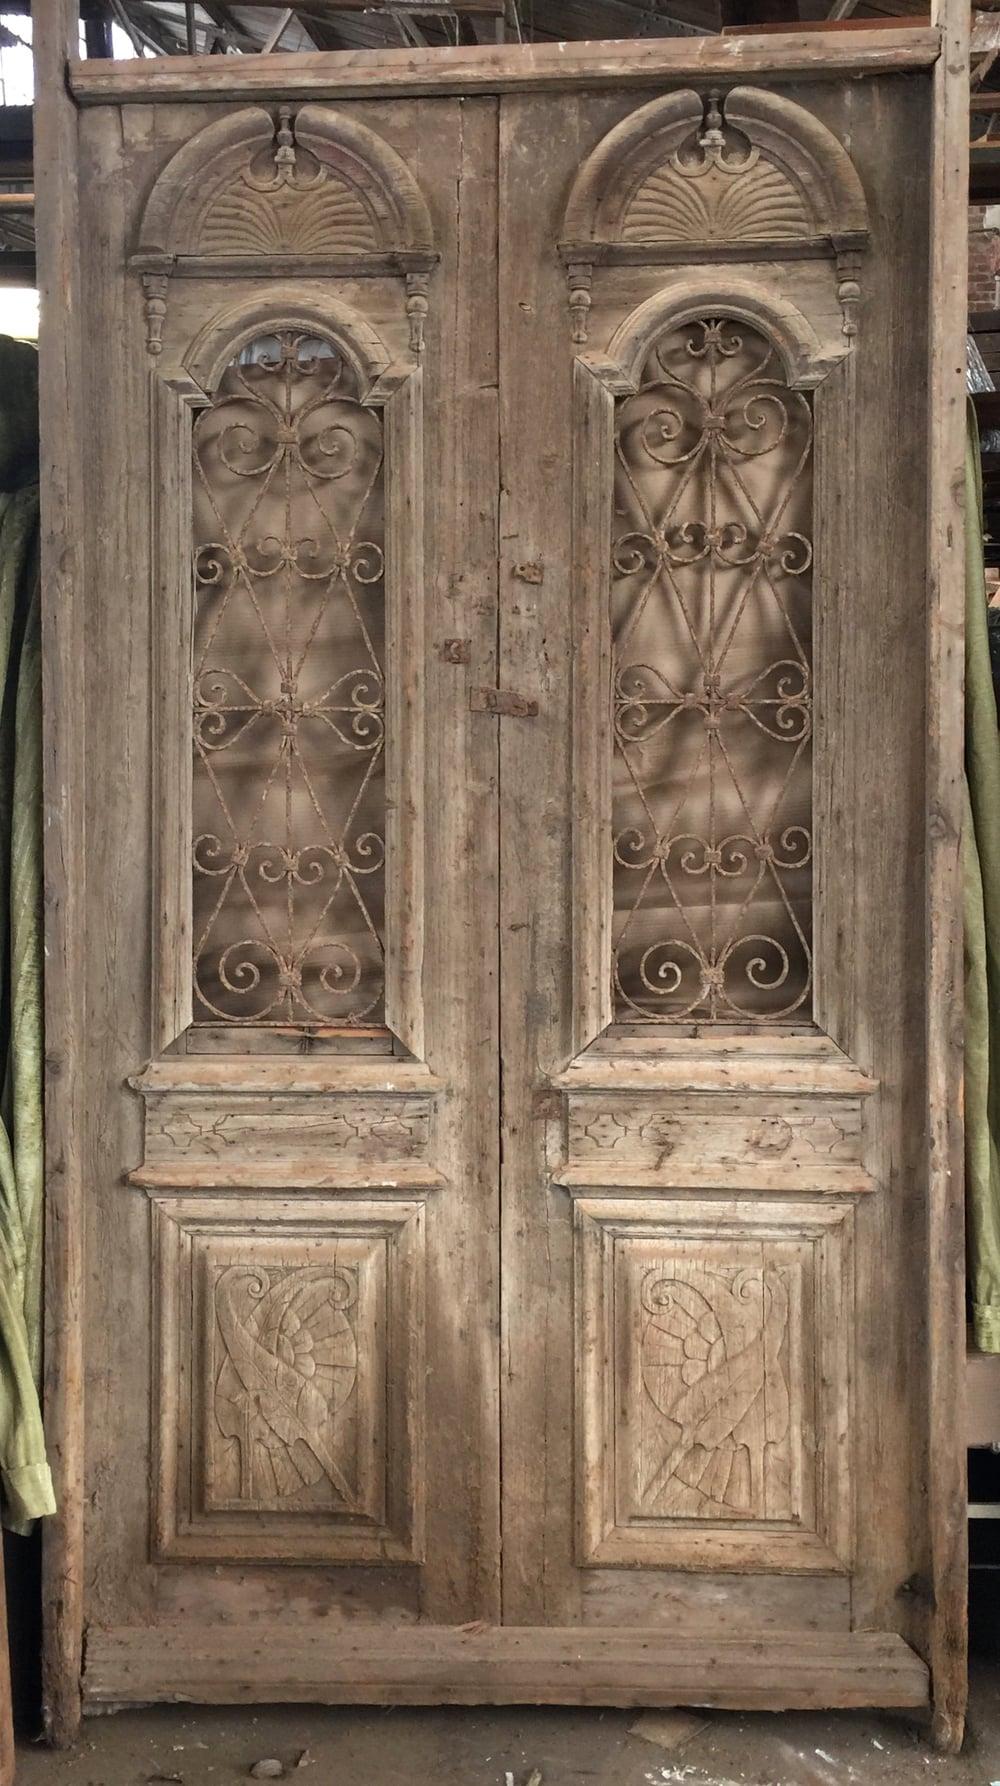 Green Painted Antique Barn Door 27\  x 70\  \u2014 $325 & Vintage Sale: Reclaimed Antique Doors \u2014 Southern Pine Company